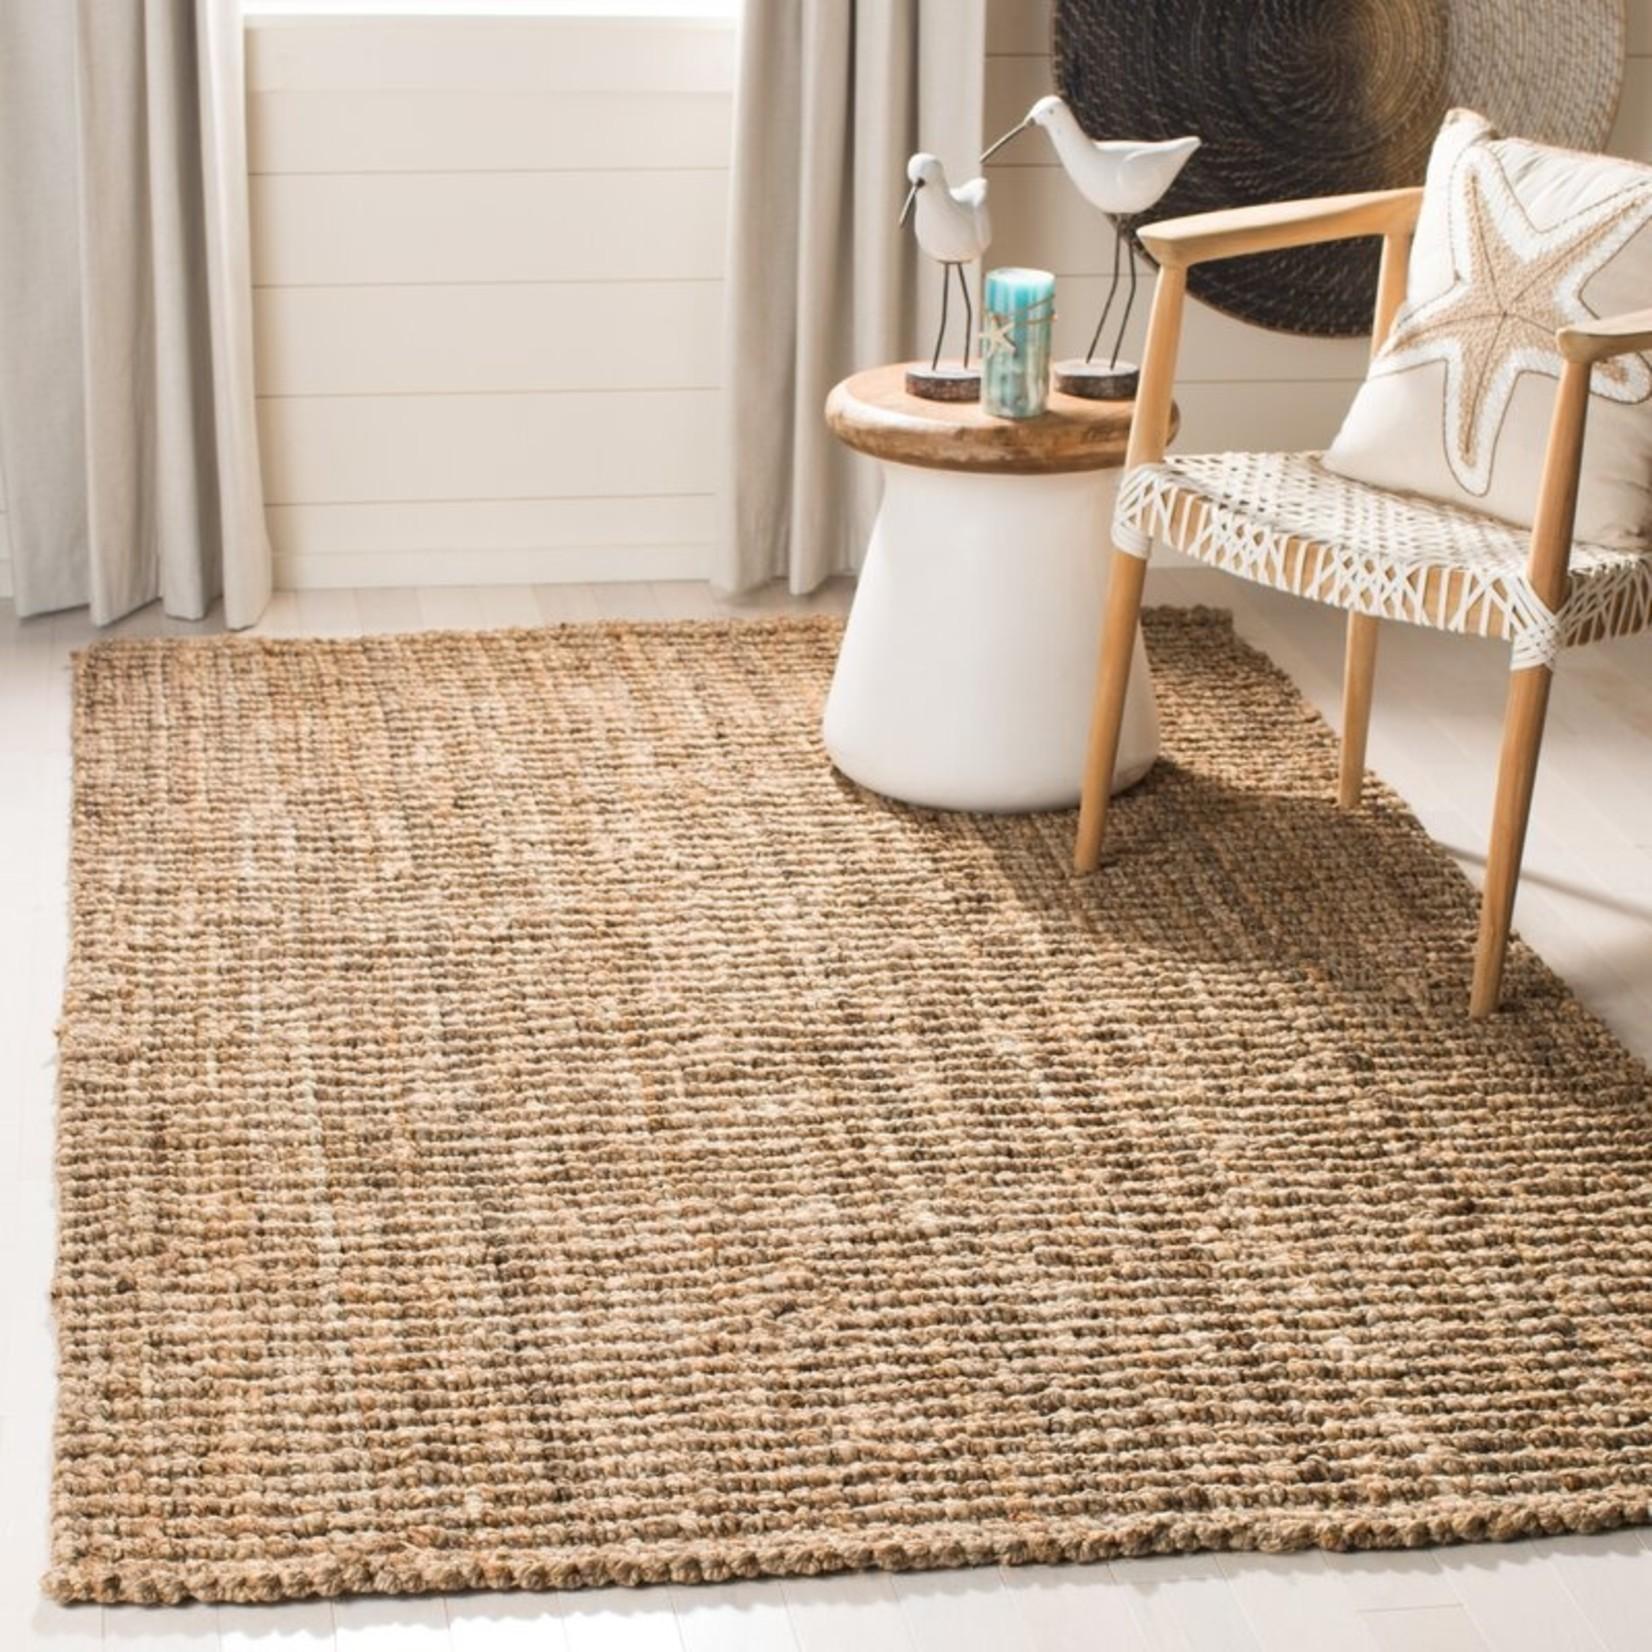 *4' x 6' - Grassmere Handmade Flatweave Natural Area Rug